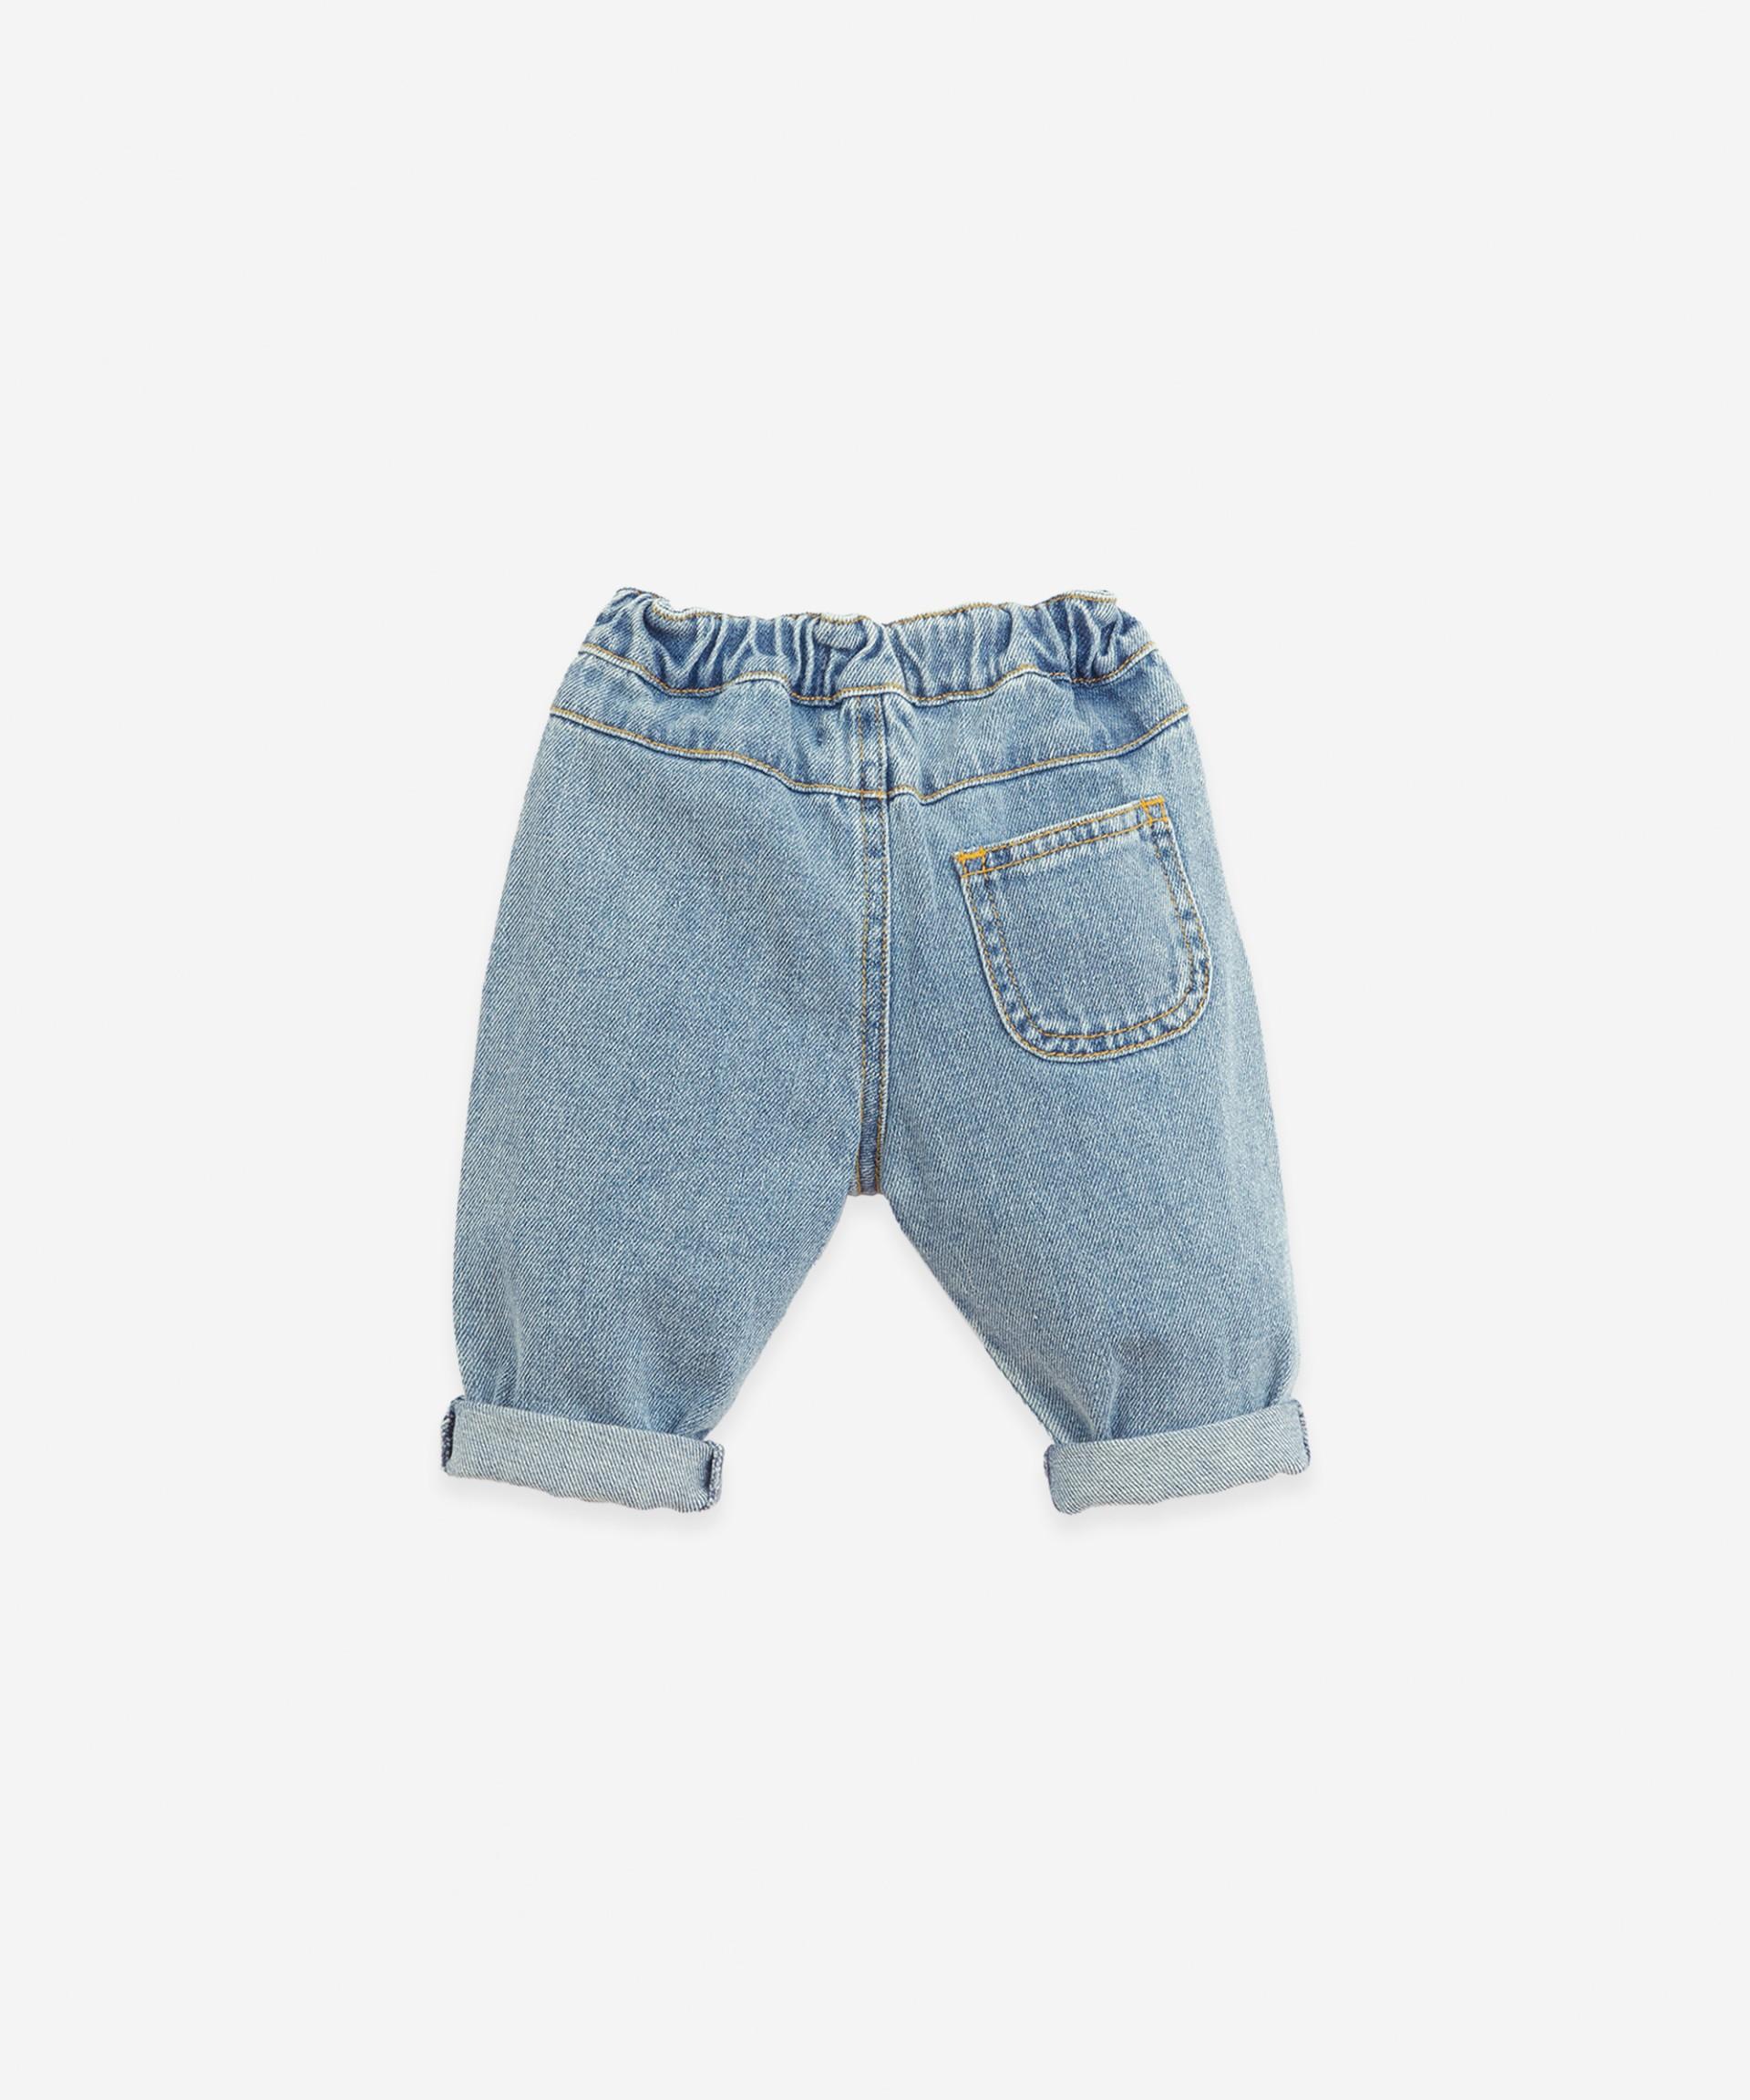 Pantaloni di jeans di cotone | Botany